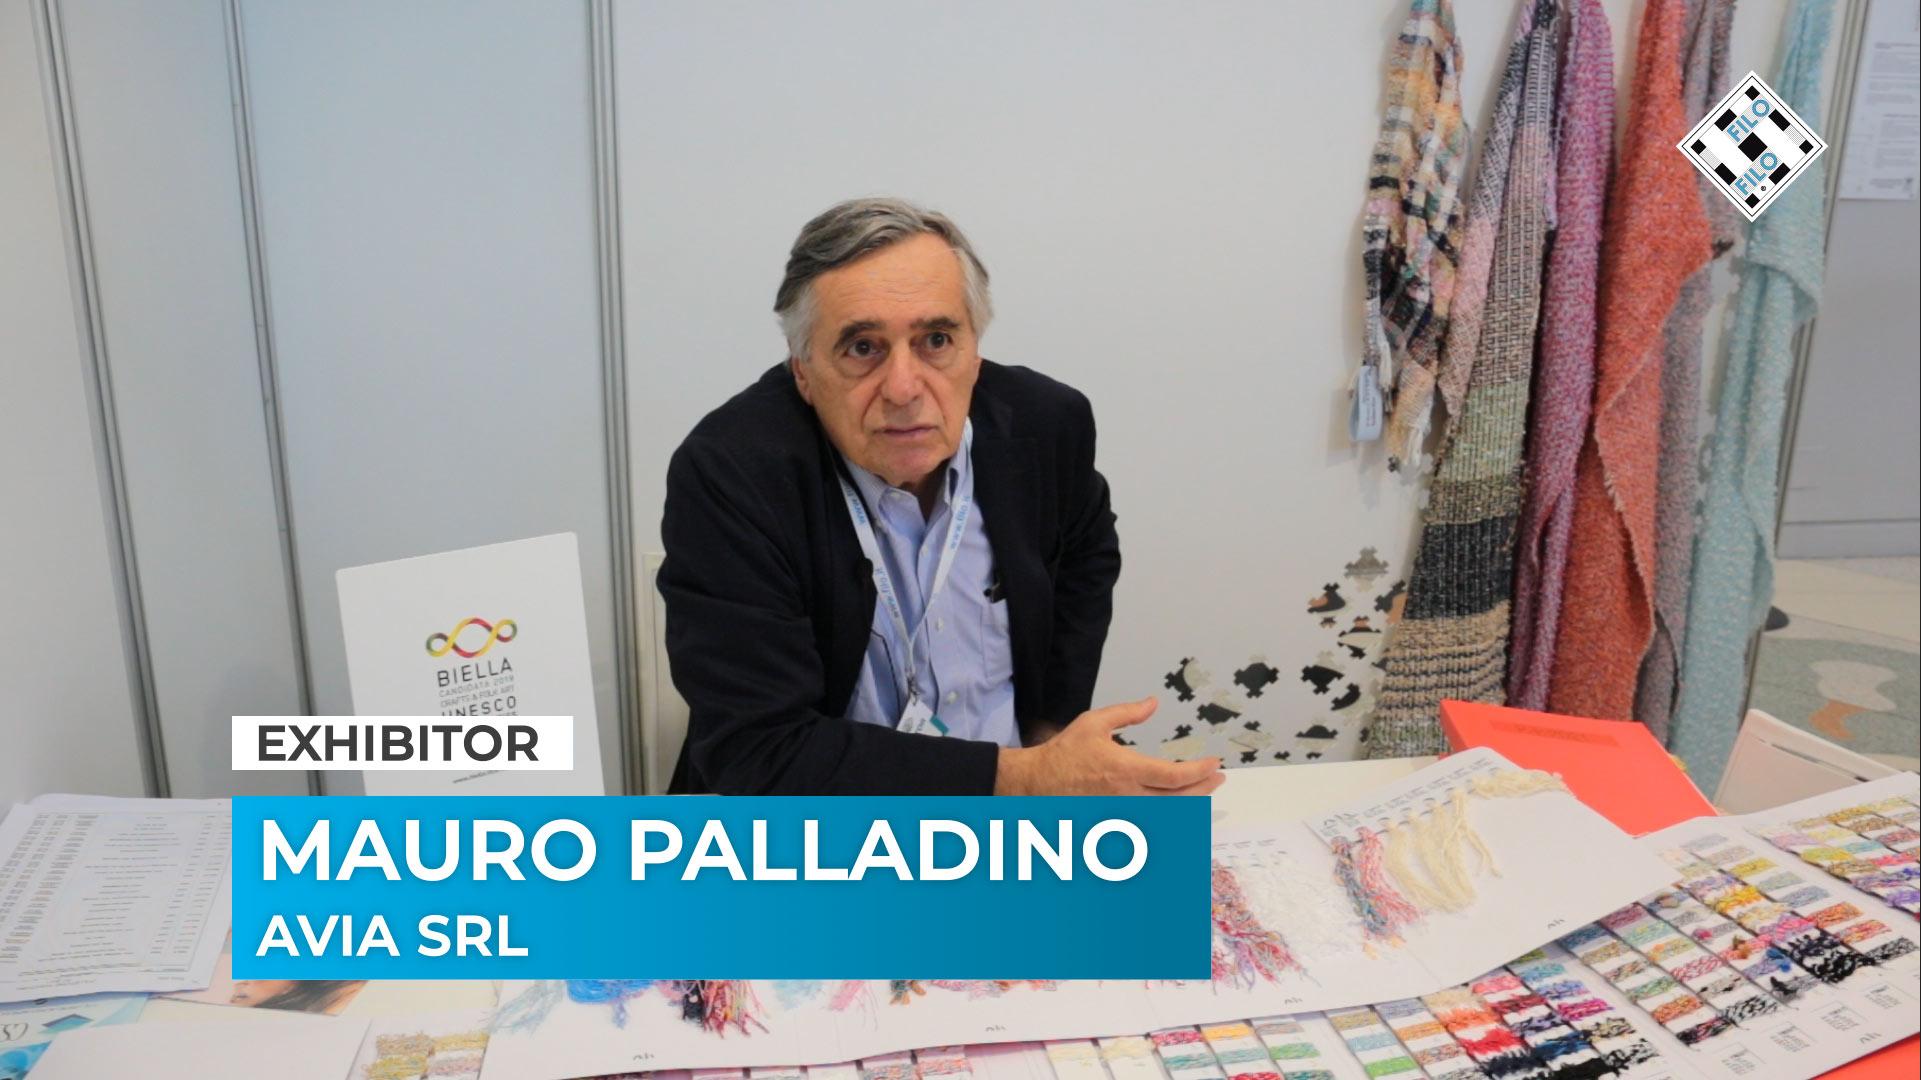 Mauro Palladino – Avia